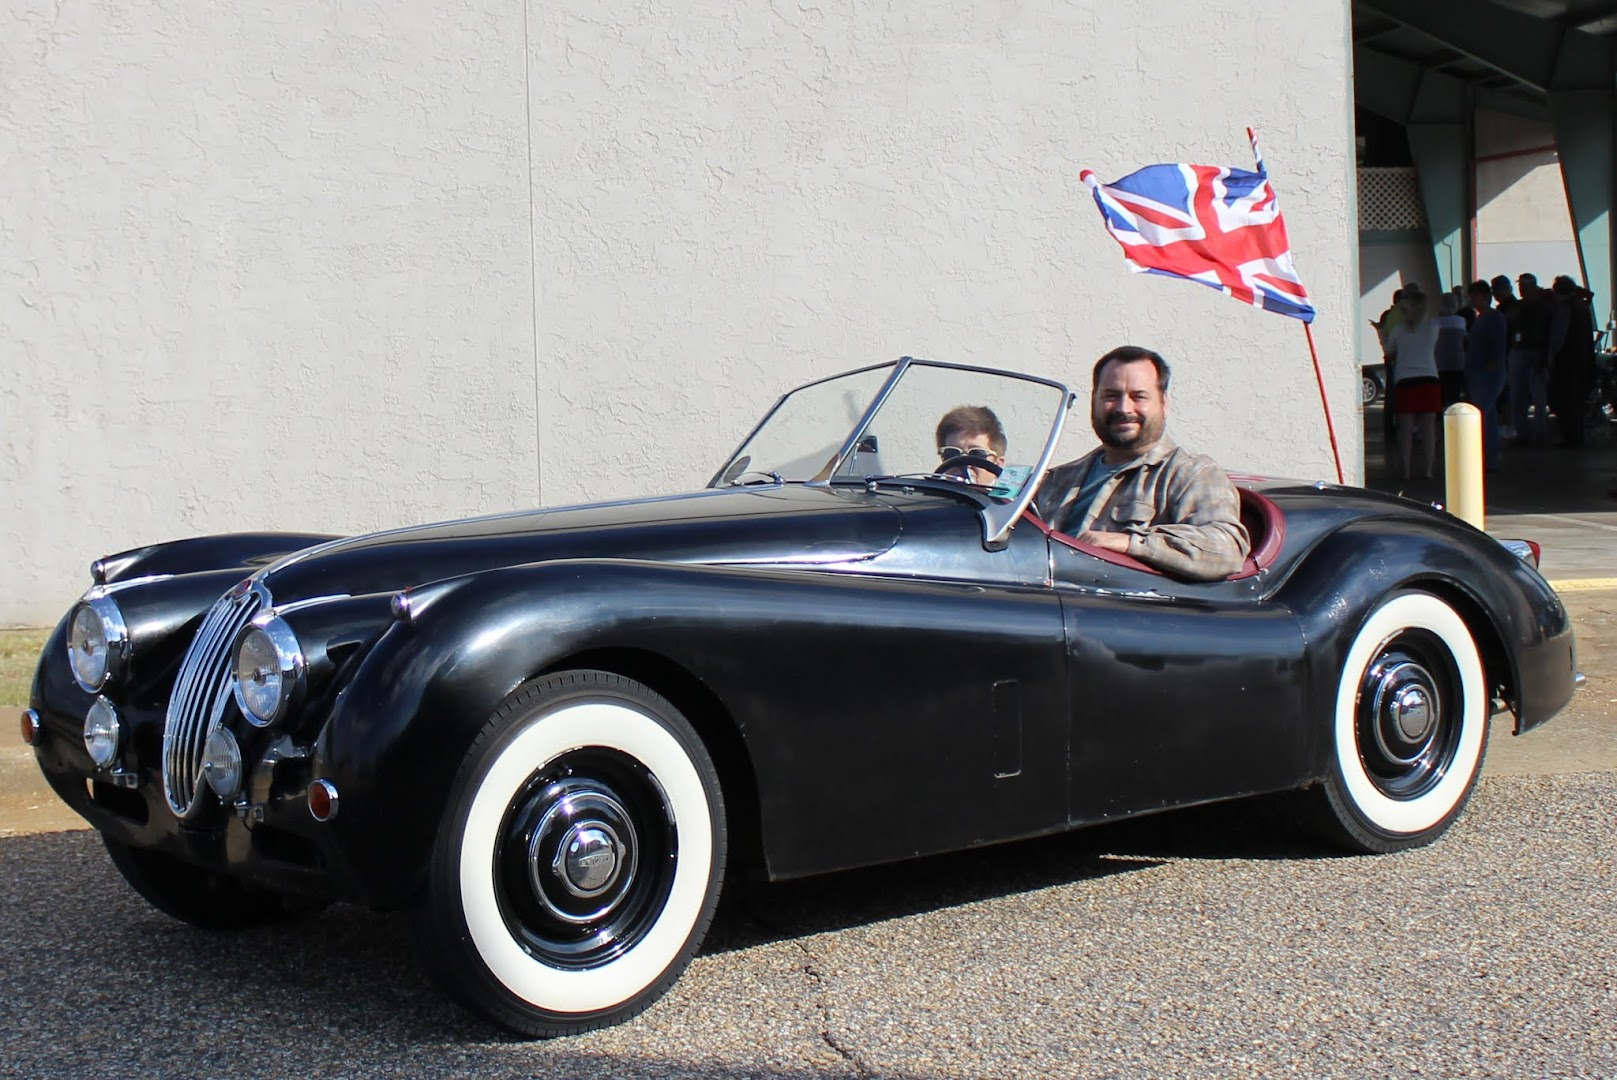 2016 British Car Show Motoring Club Wiring Diagrams 1957 Jaguar Xk140 Paul Casarona Ots